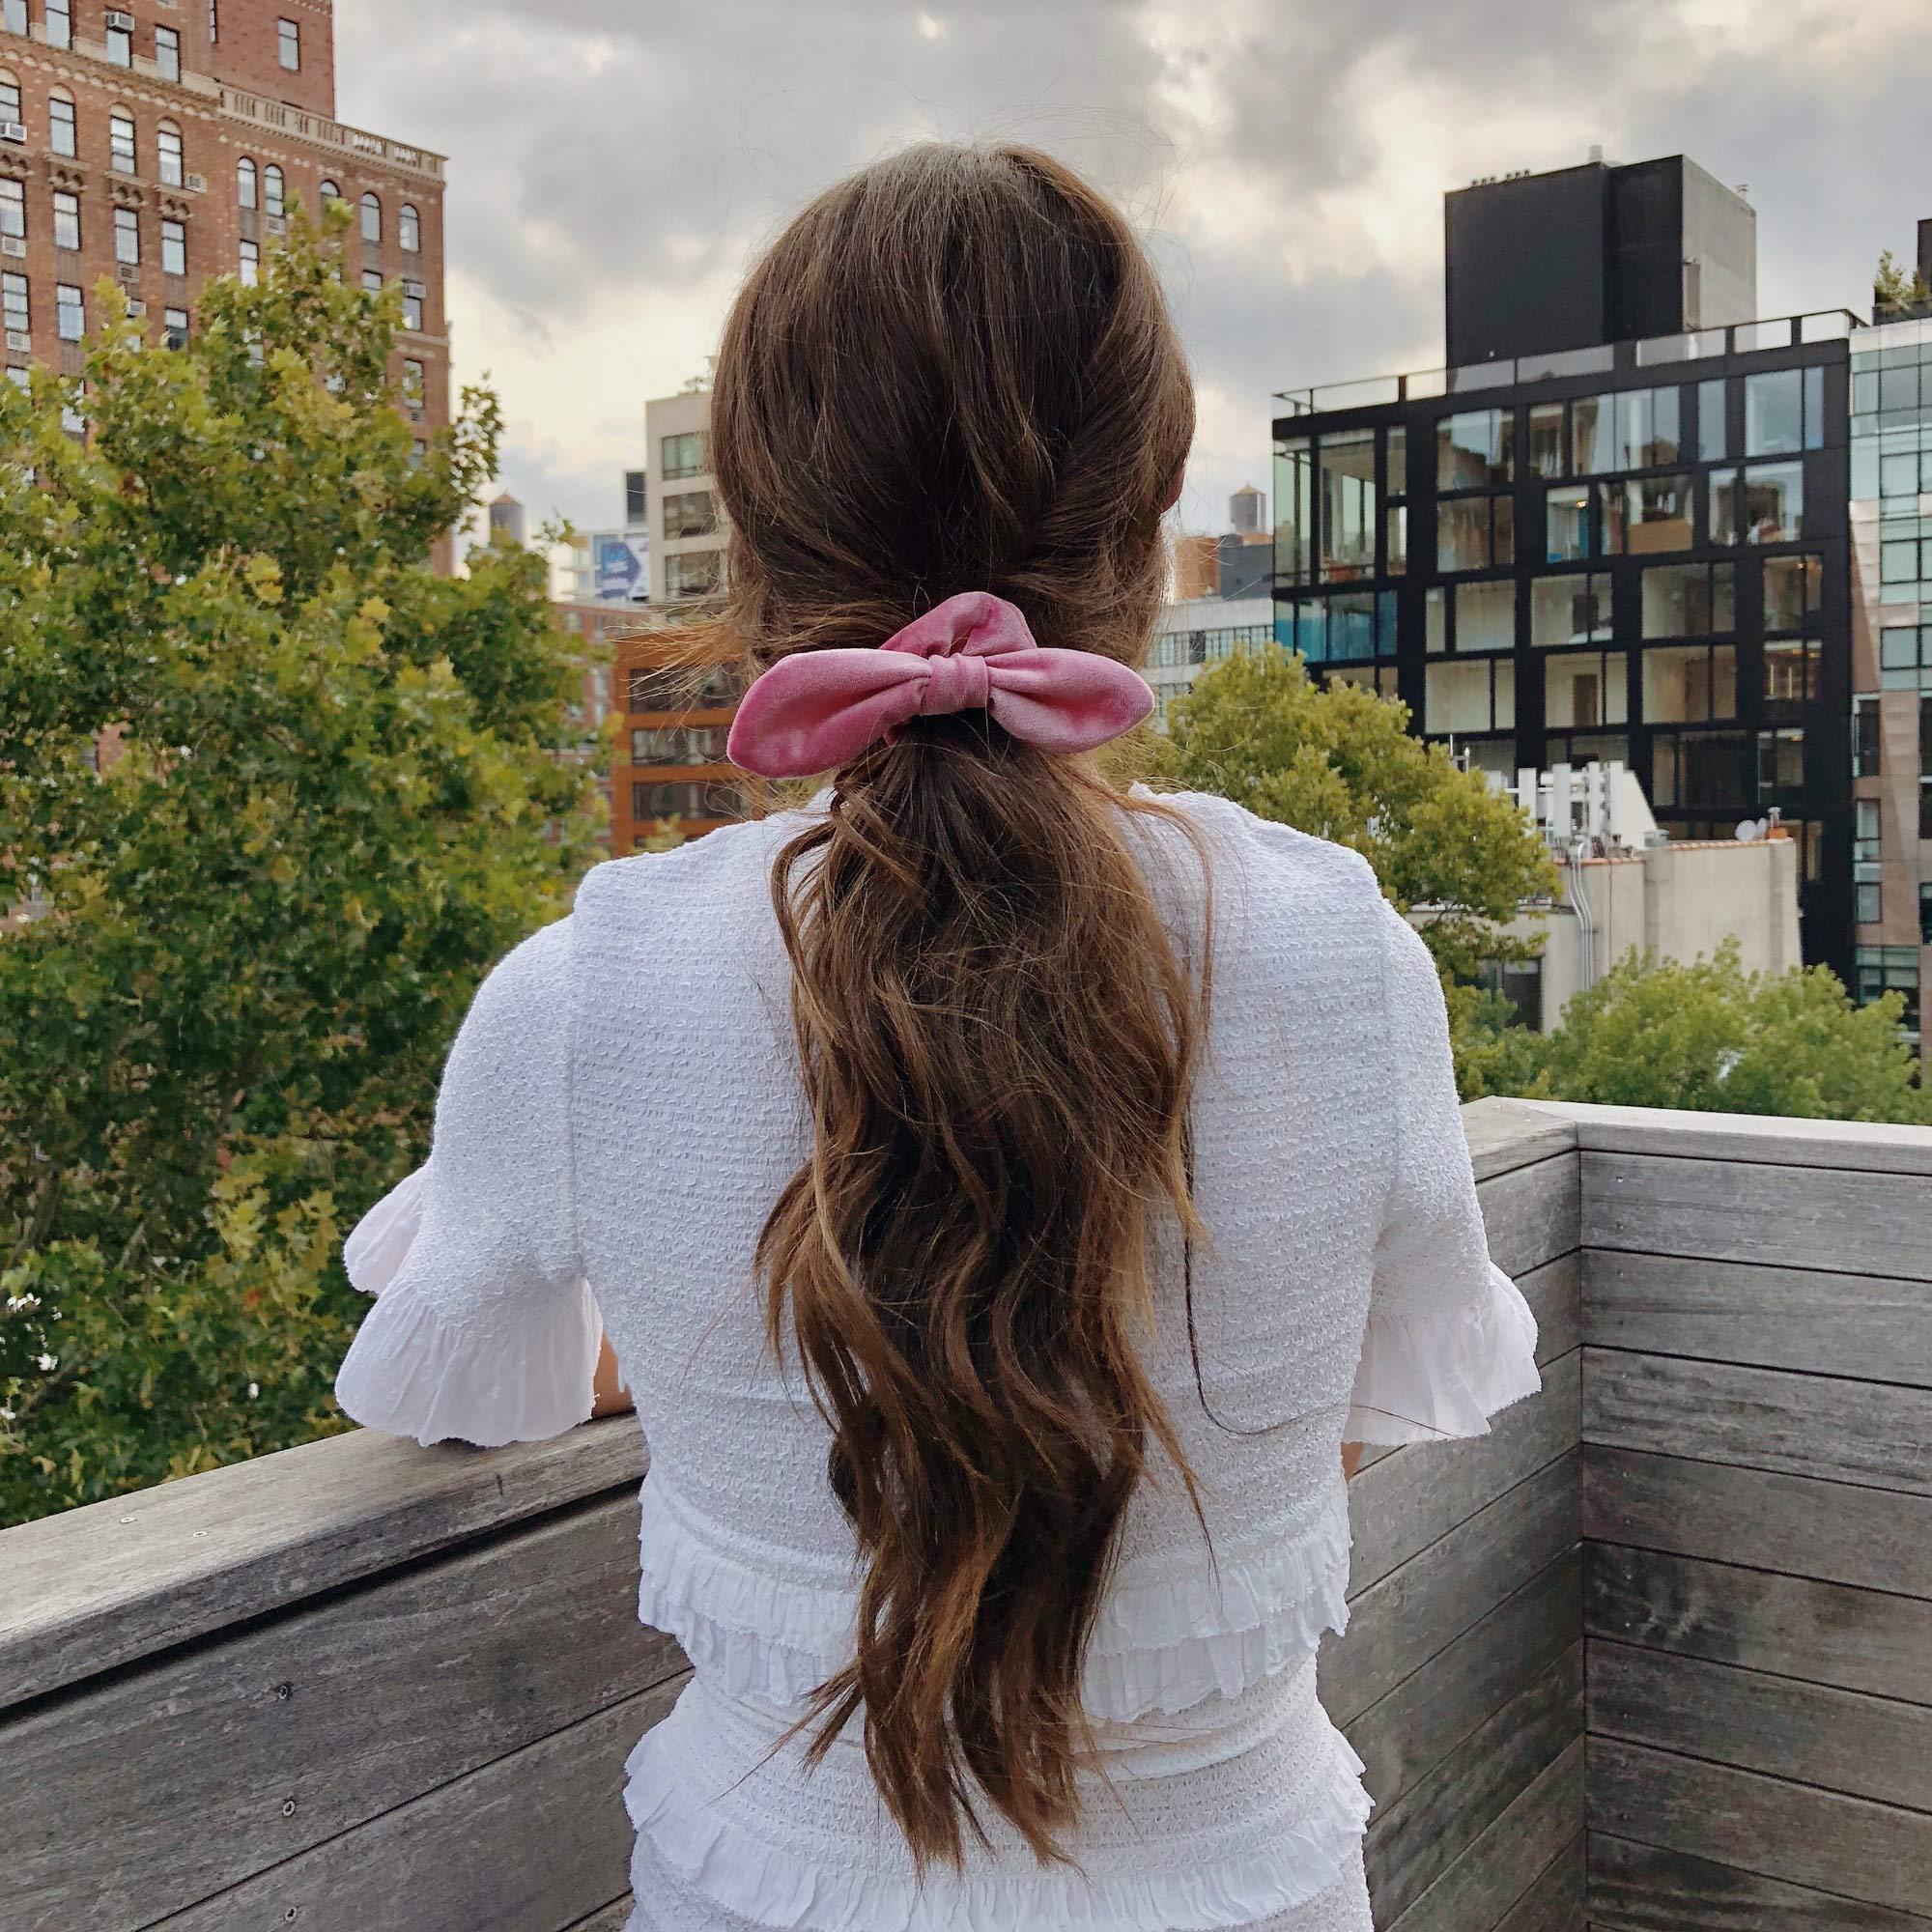 Simnice 25 Pack Hair Scrunchies Rabbit Bunny Ear Bow Bowknot Scrunchie Velvet Scrunchy Bobbles Elastic Hair Ties Bands Ponytail Holder by Simnice (Image #8)